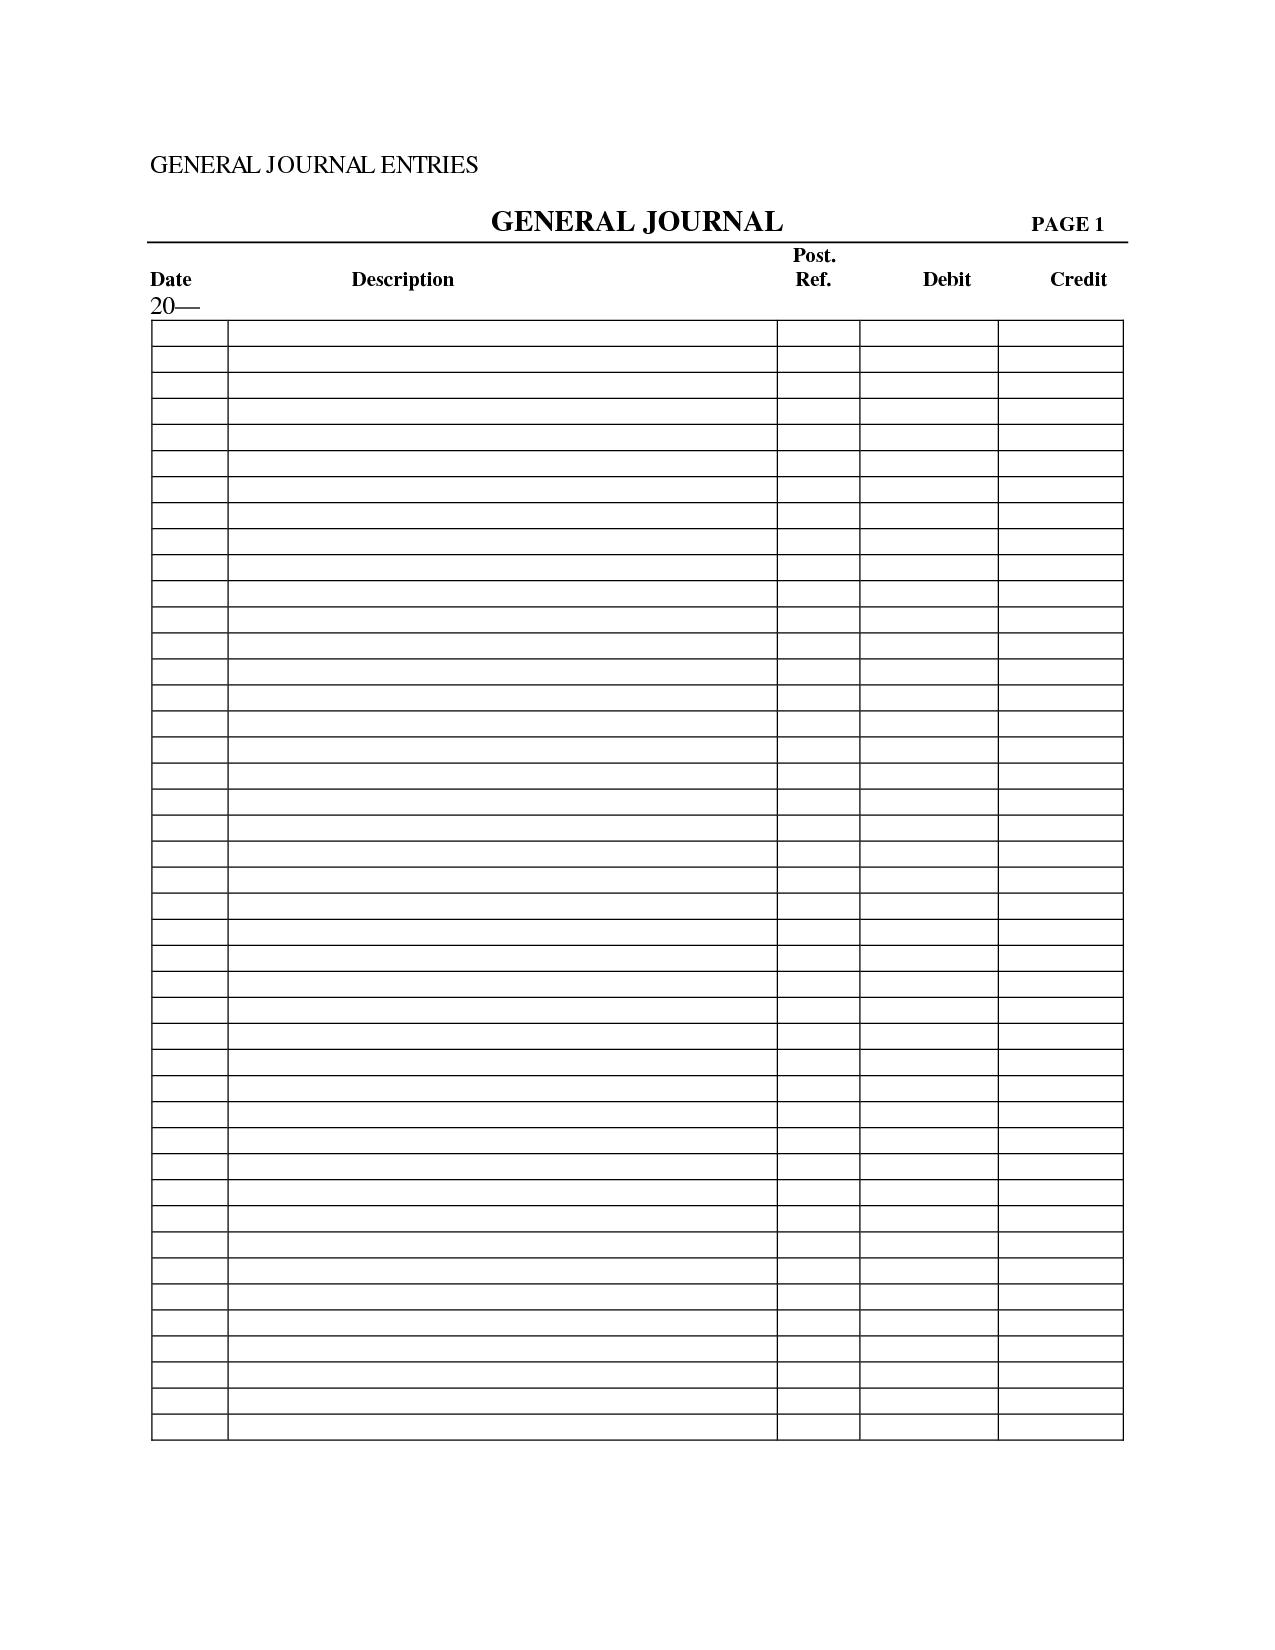 Printable General Journal Voucher Template